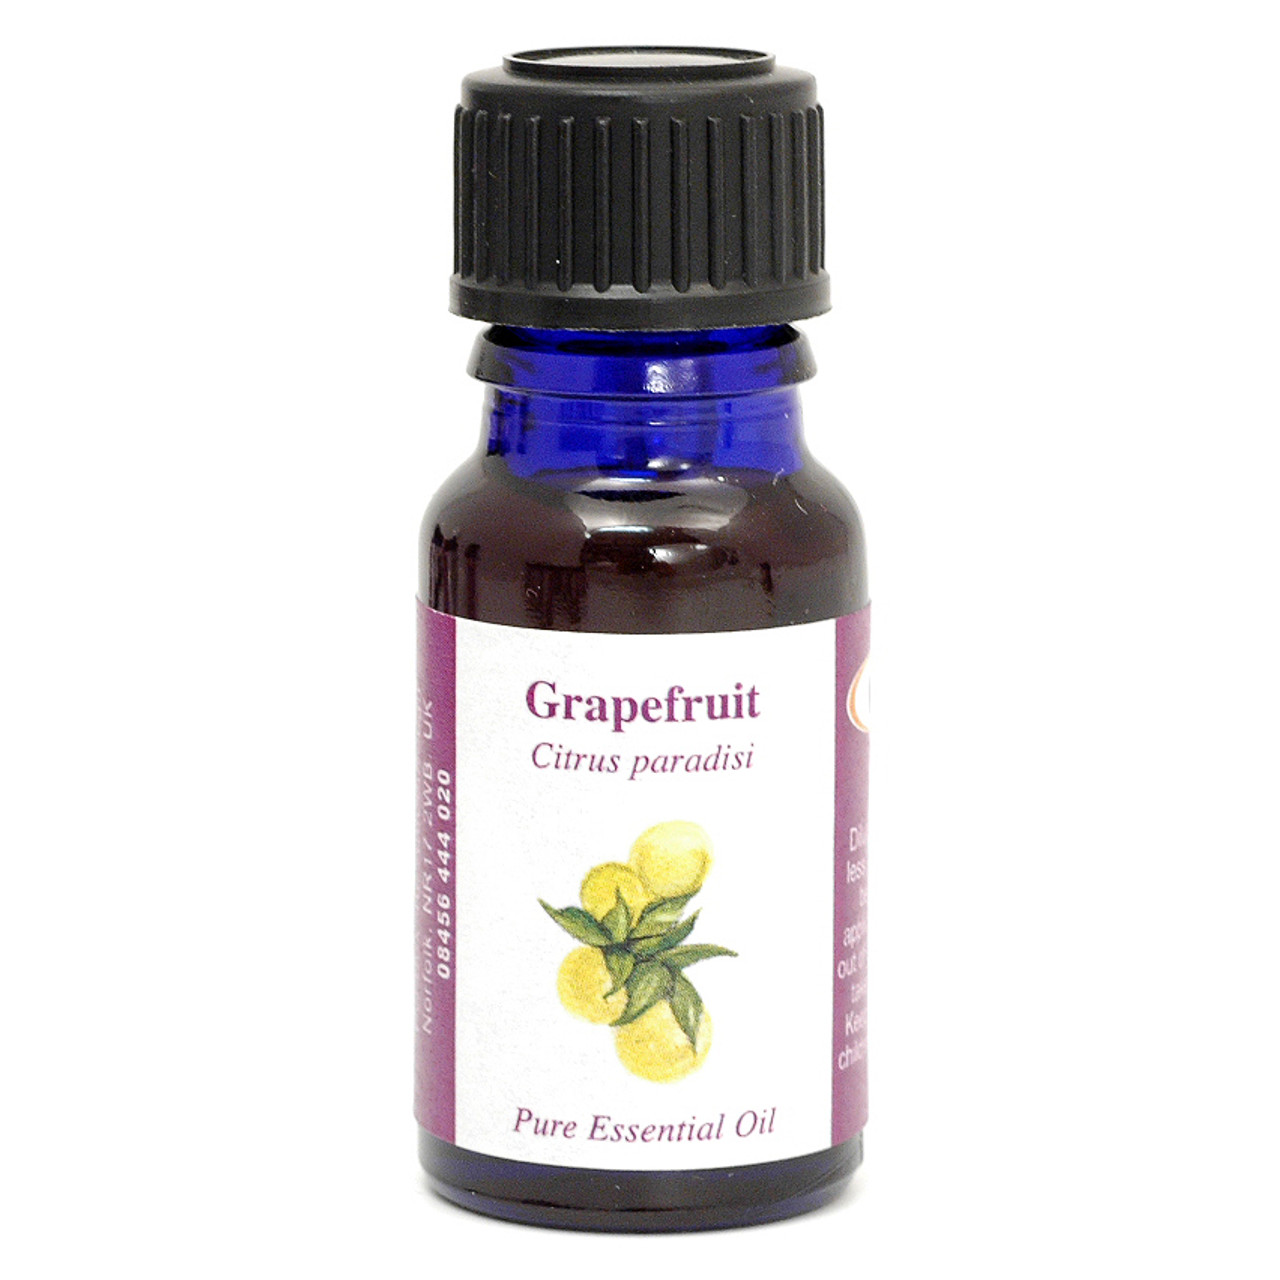 Grapefruit Essential Oil (California) - 10 ml (100% Pure Concentrated)